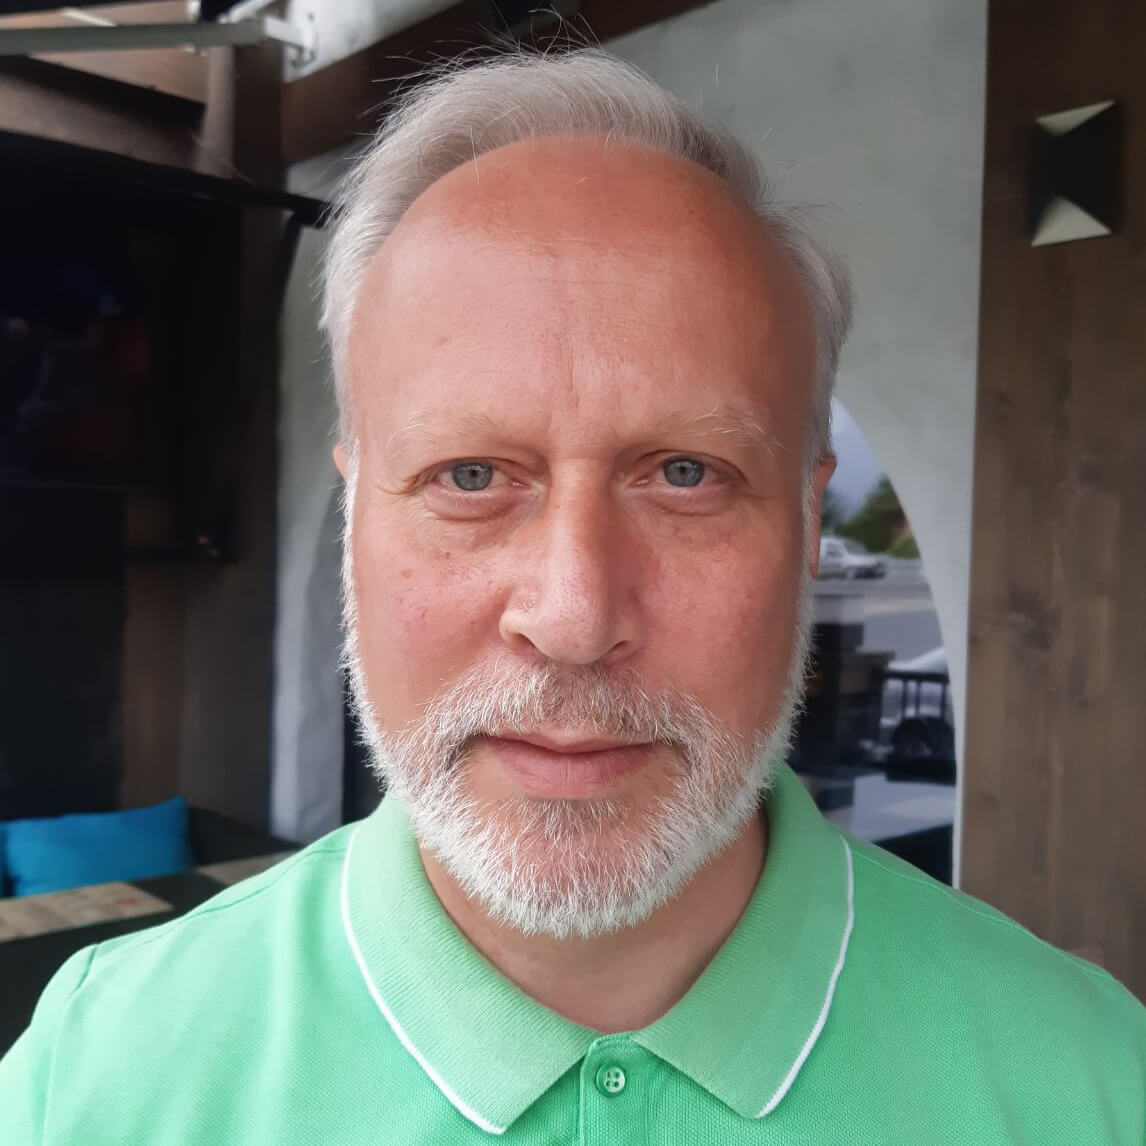 Volodymyr G. PALANT